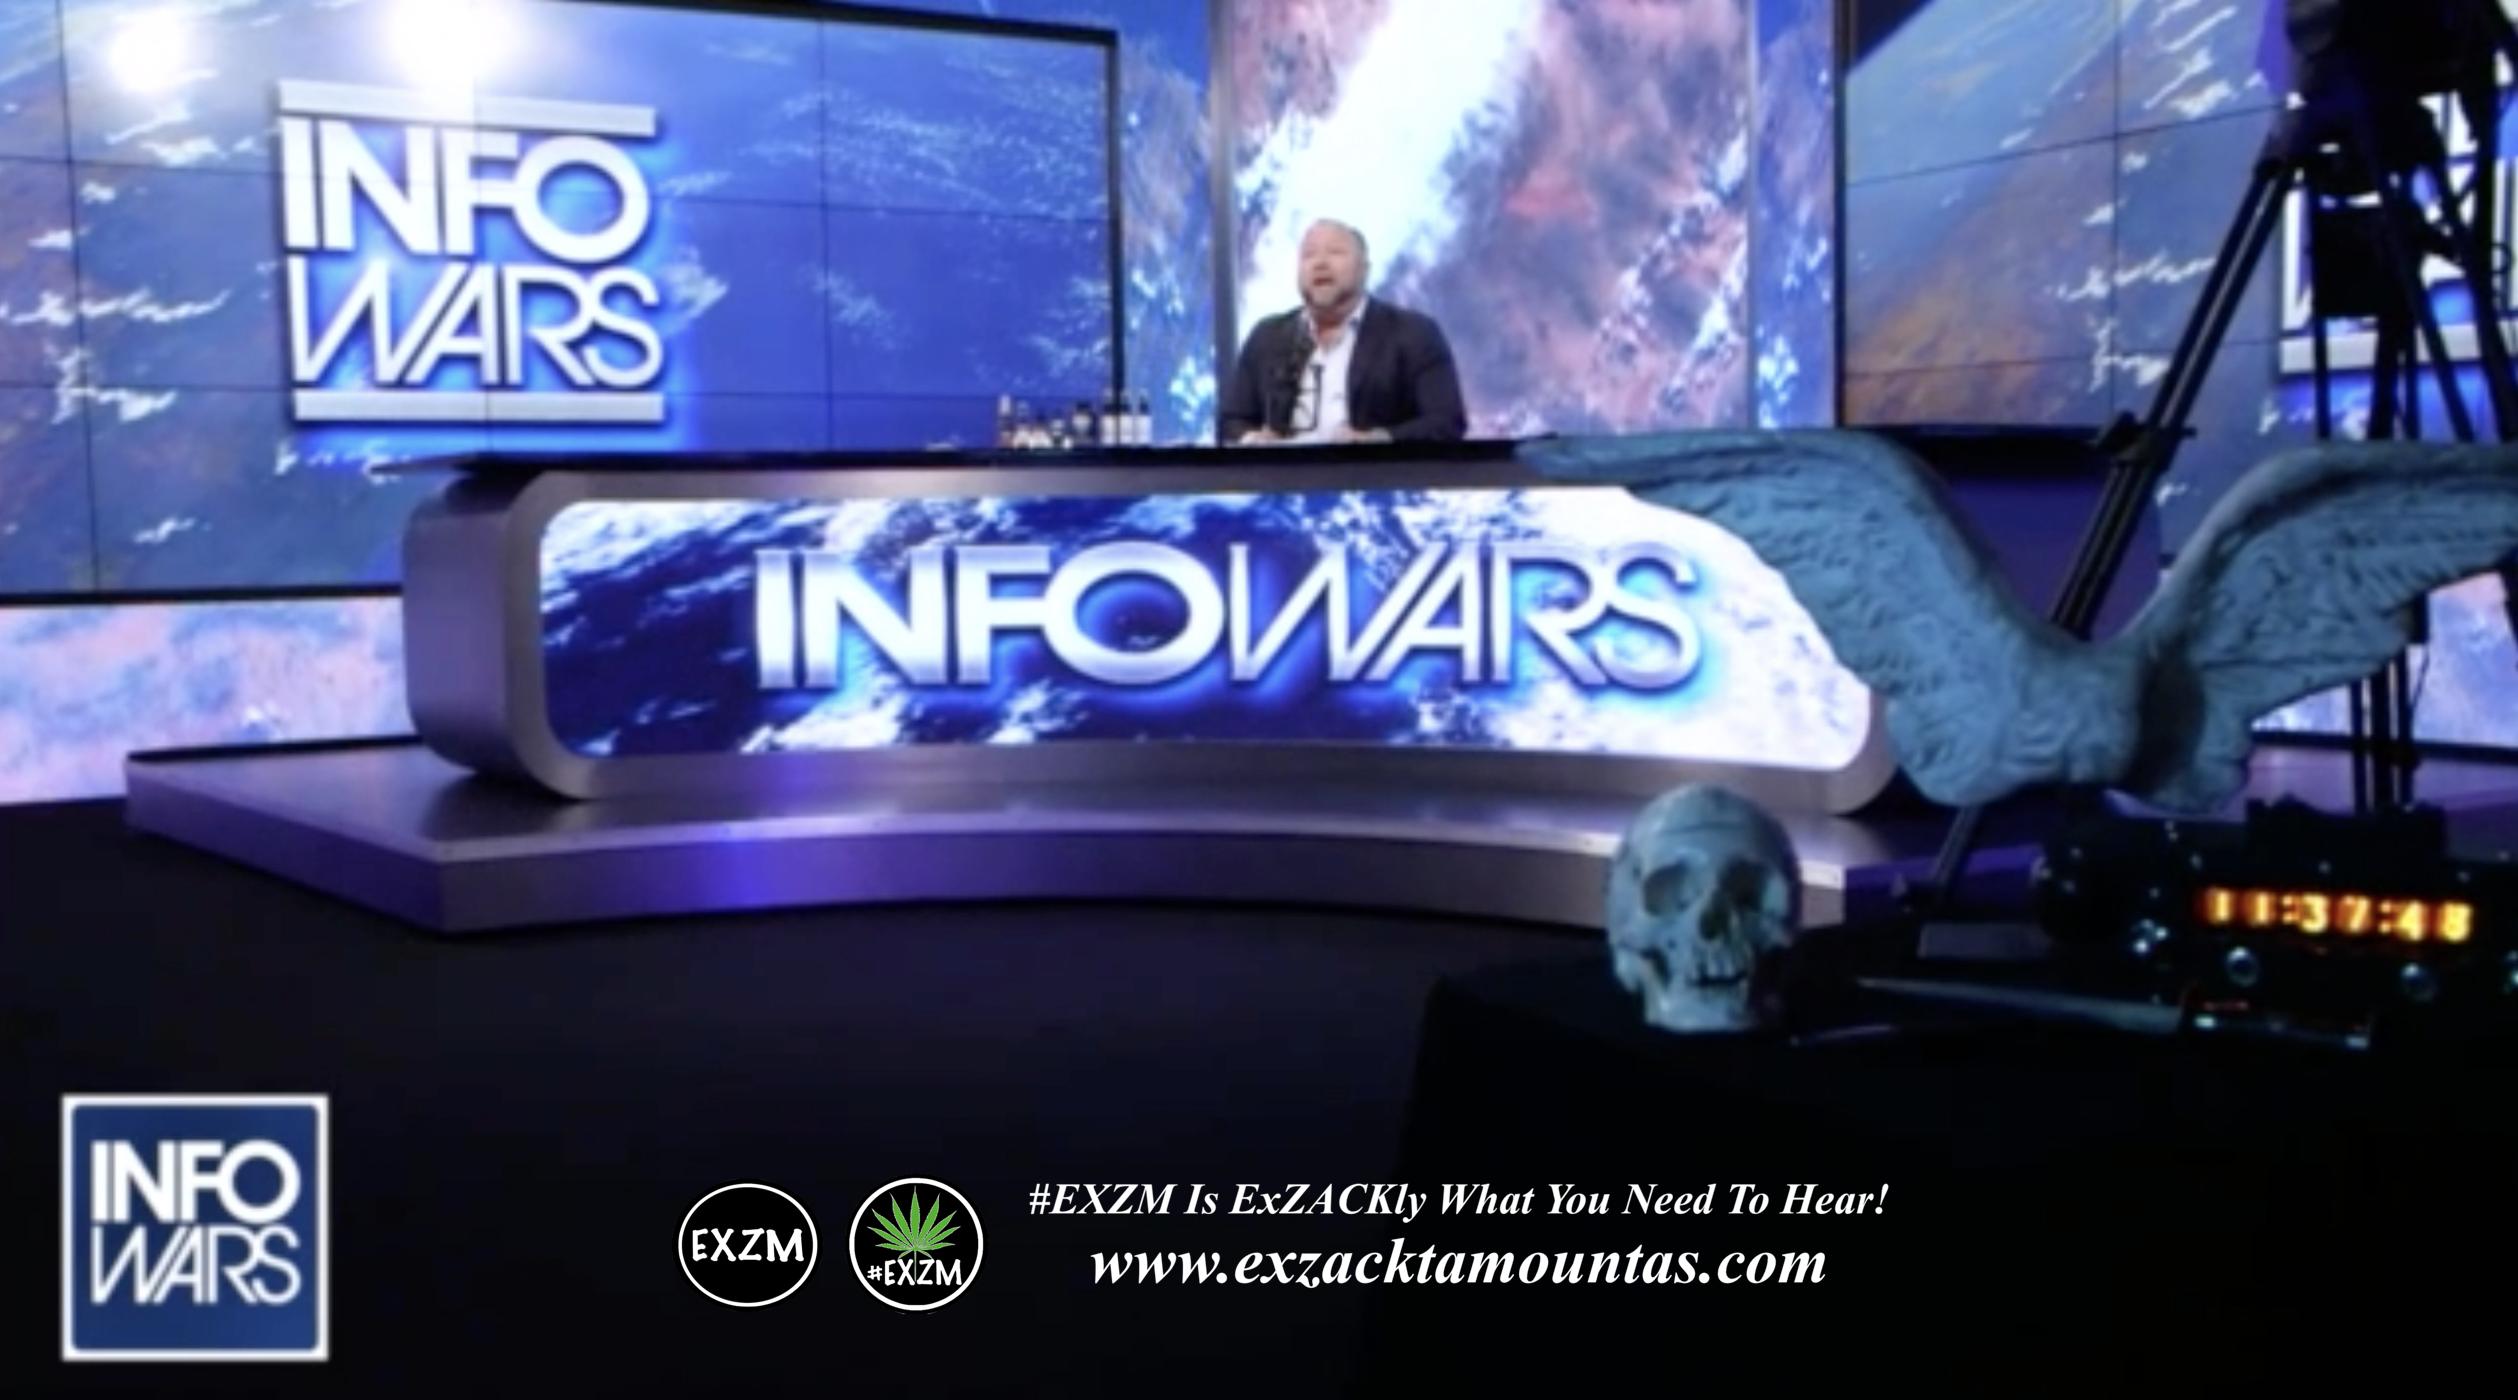 Alex Jones Live Infowars Studio EXZM Zack Mount March 24th 2021 copy